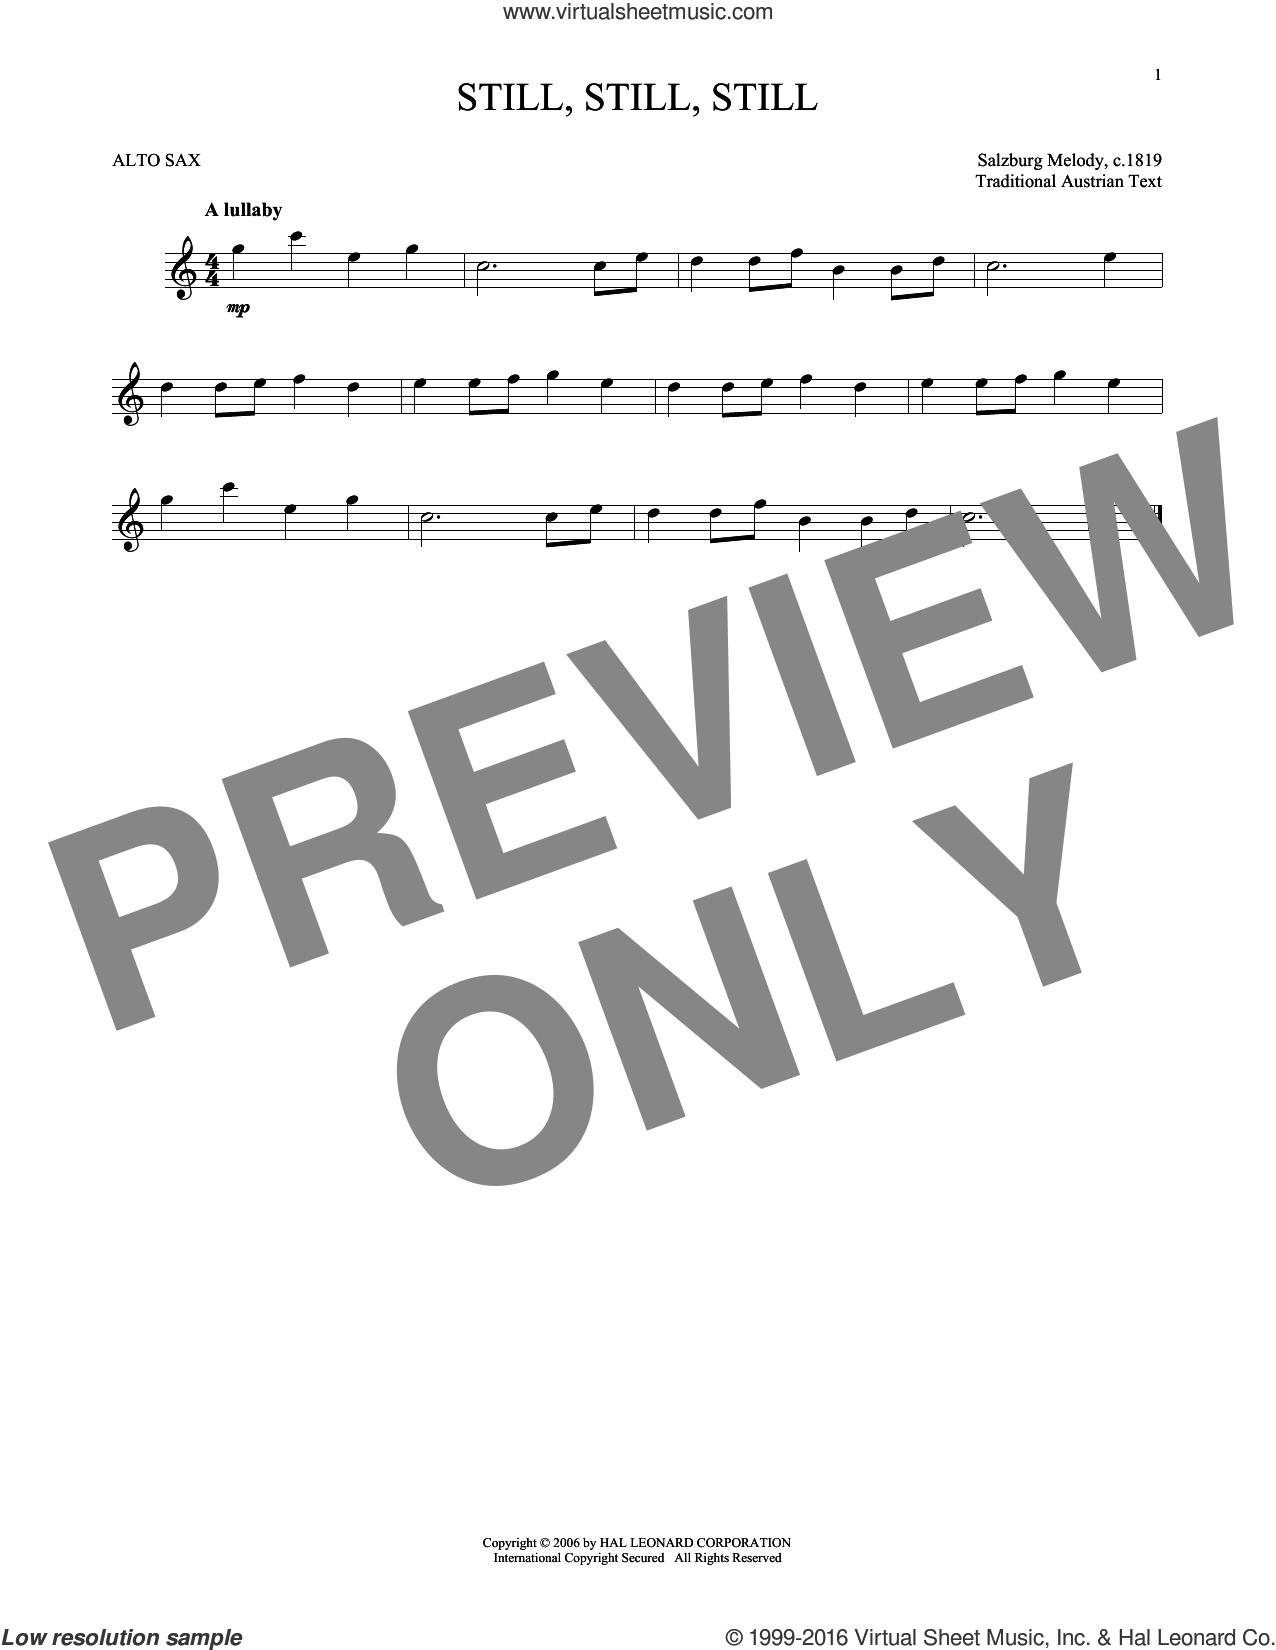 Still, Still, Still sheet music for alto saxophone solo by Salzburg Melody c.1819 and Miscellaneous, intermediate skill level